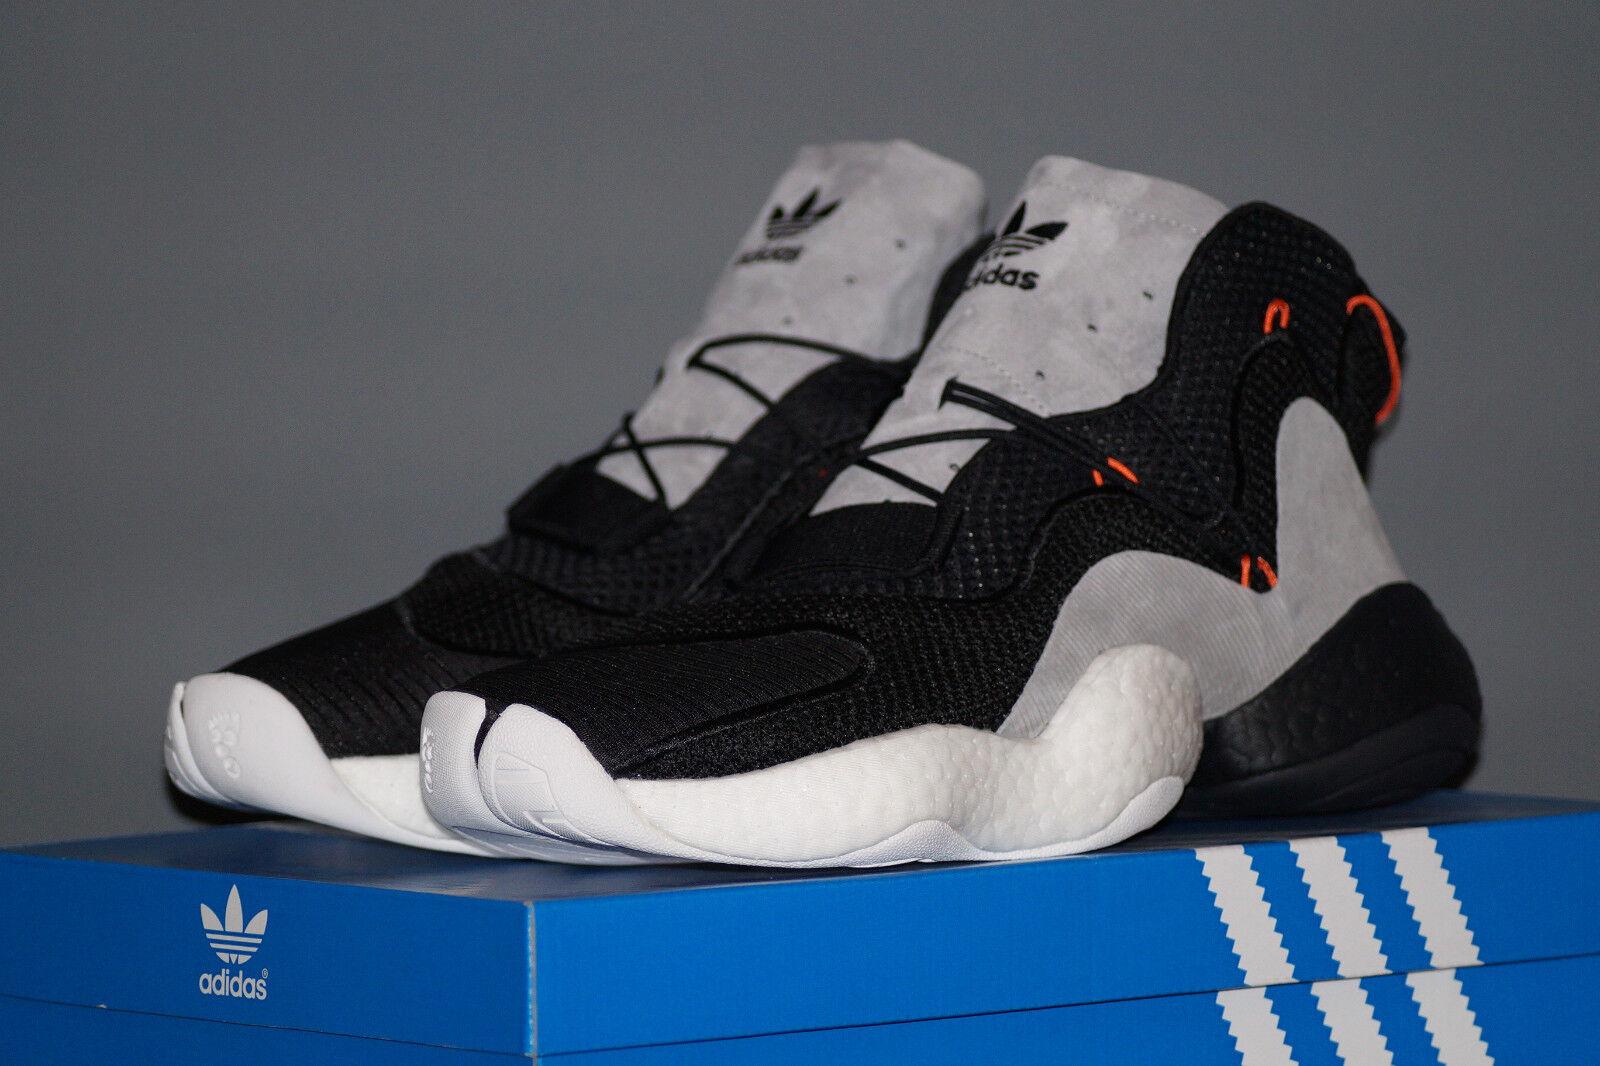 Adidas originals CRAZY BYW EU 45.3 UK 10.5 schwarz grau Turnschuhe Trainers CQ0993